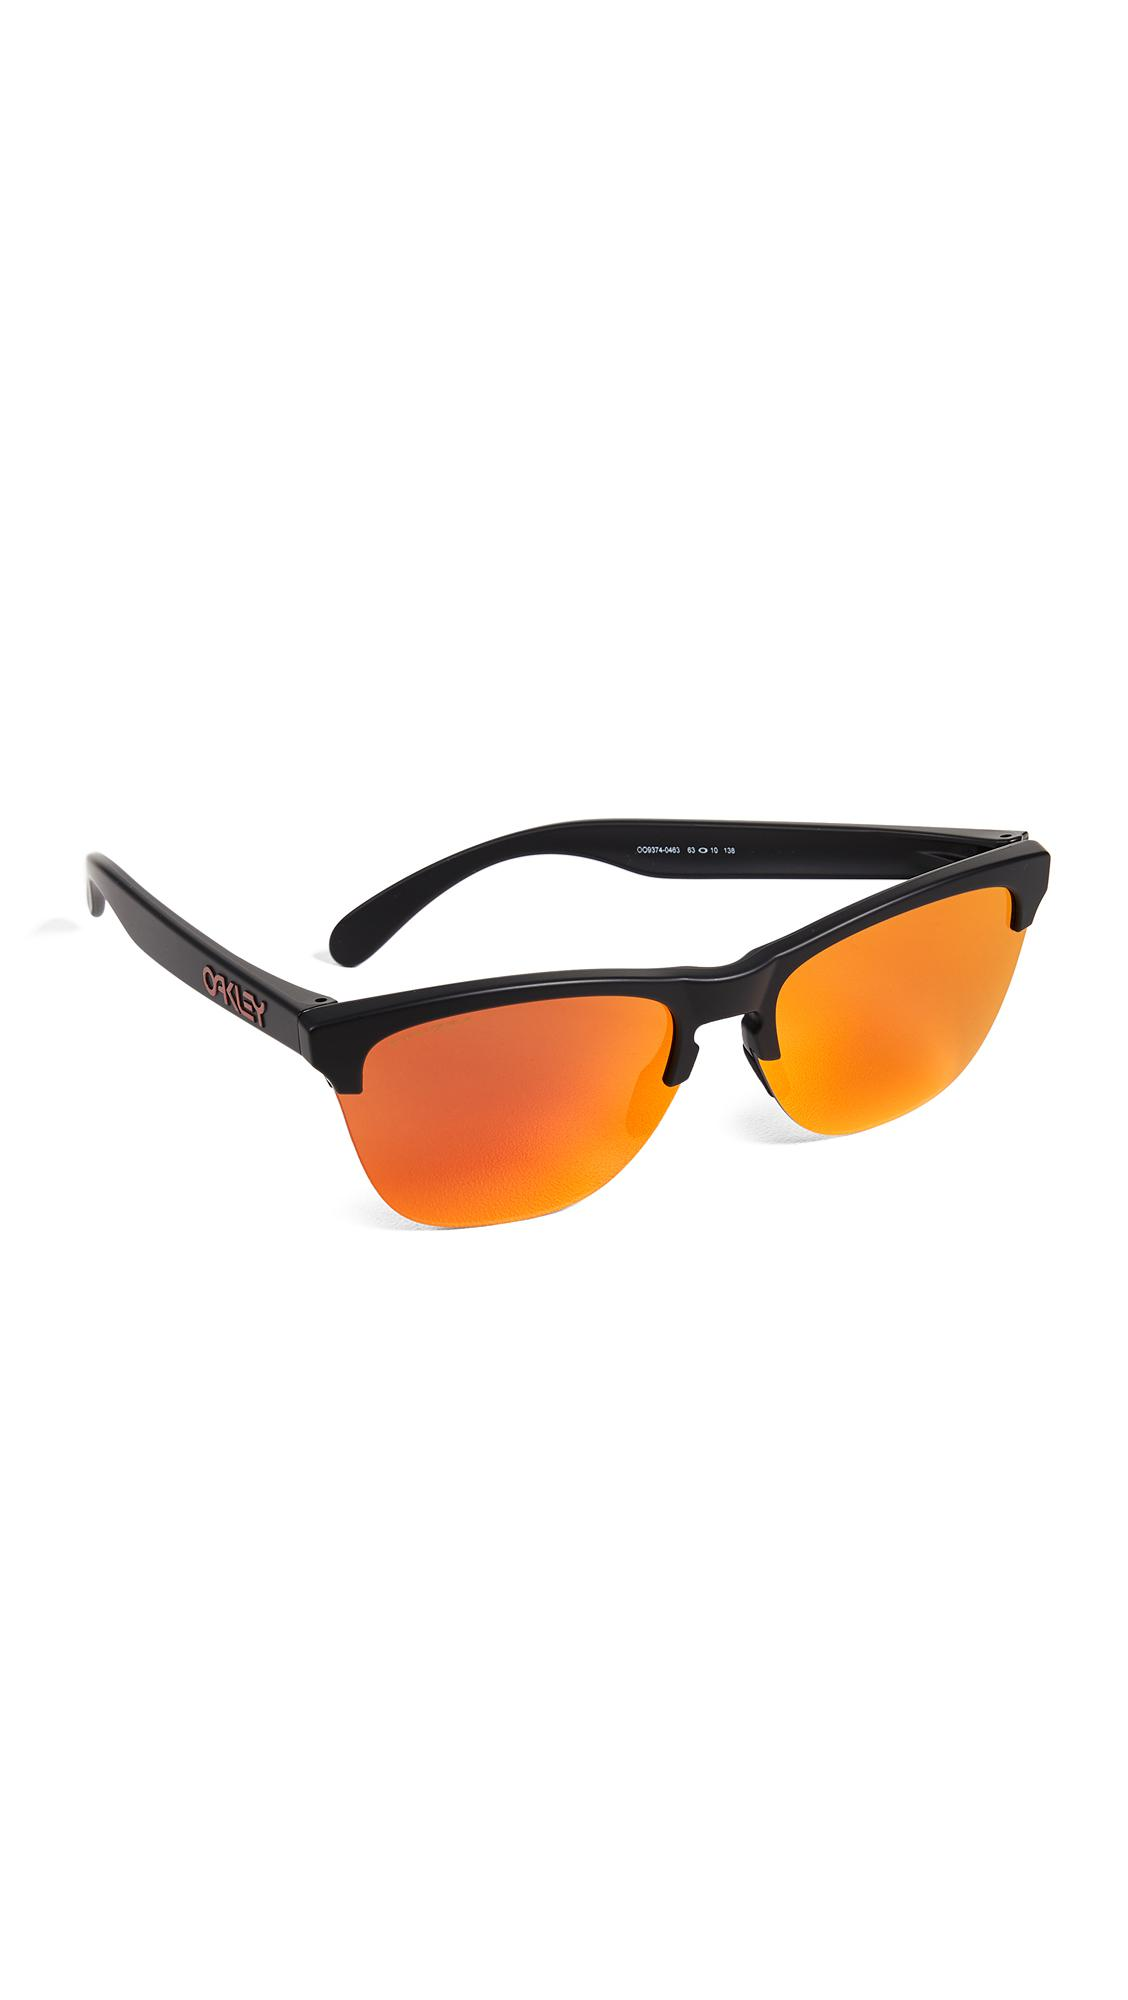 622b04b9123 Oakley Frogskins Lite Sunglasses for Men - Lyst